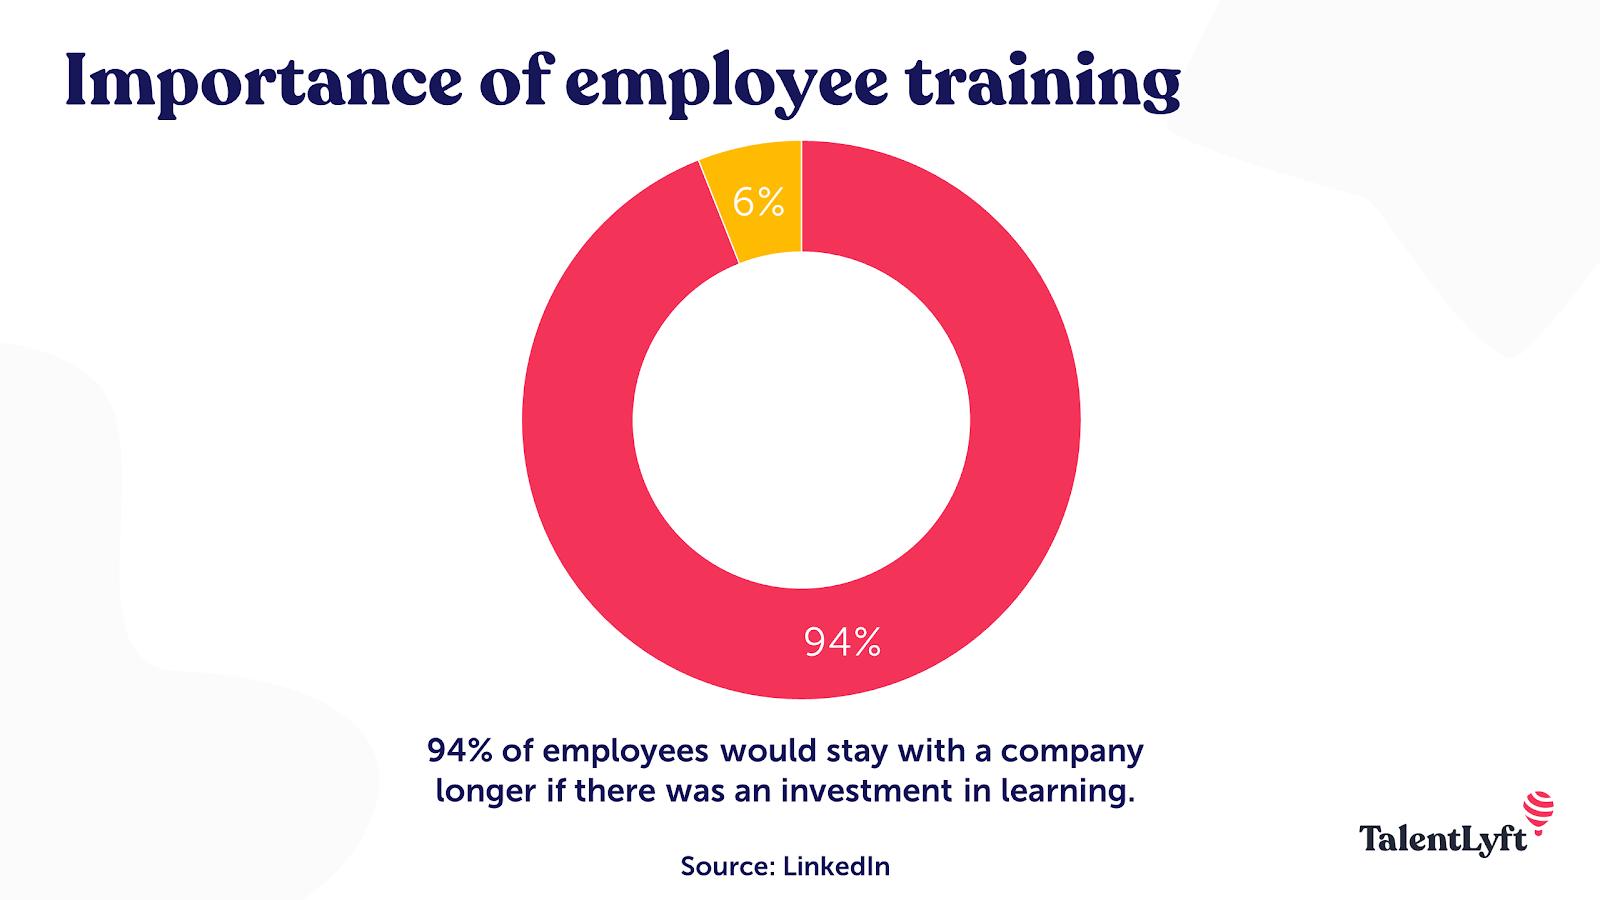 Importance of employee training post pandemic